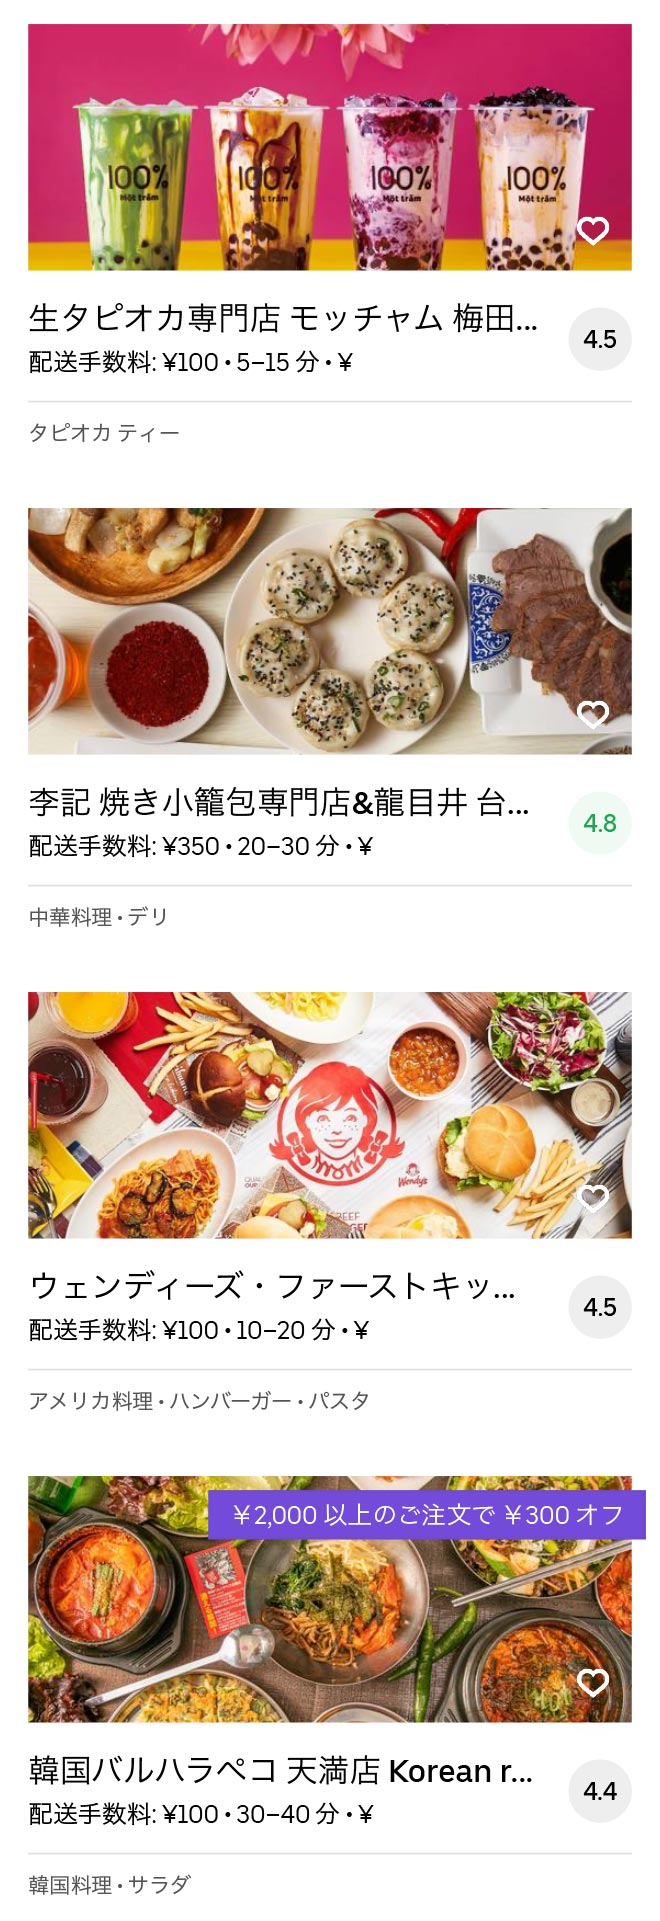 Osaka umeda menu 2005 12